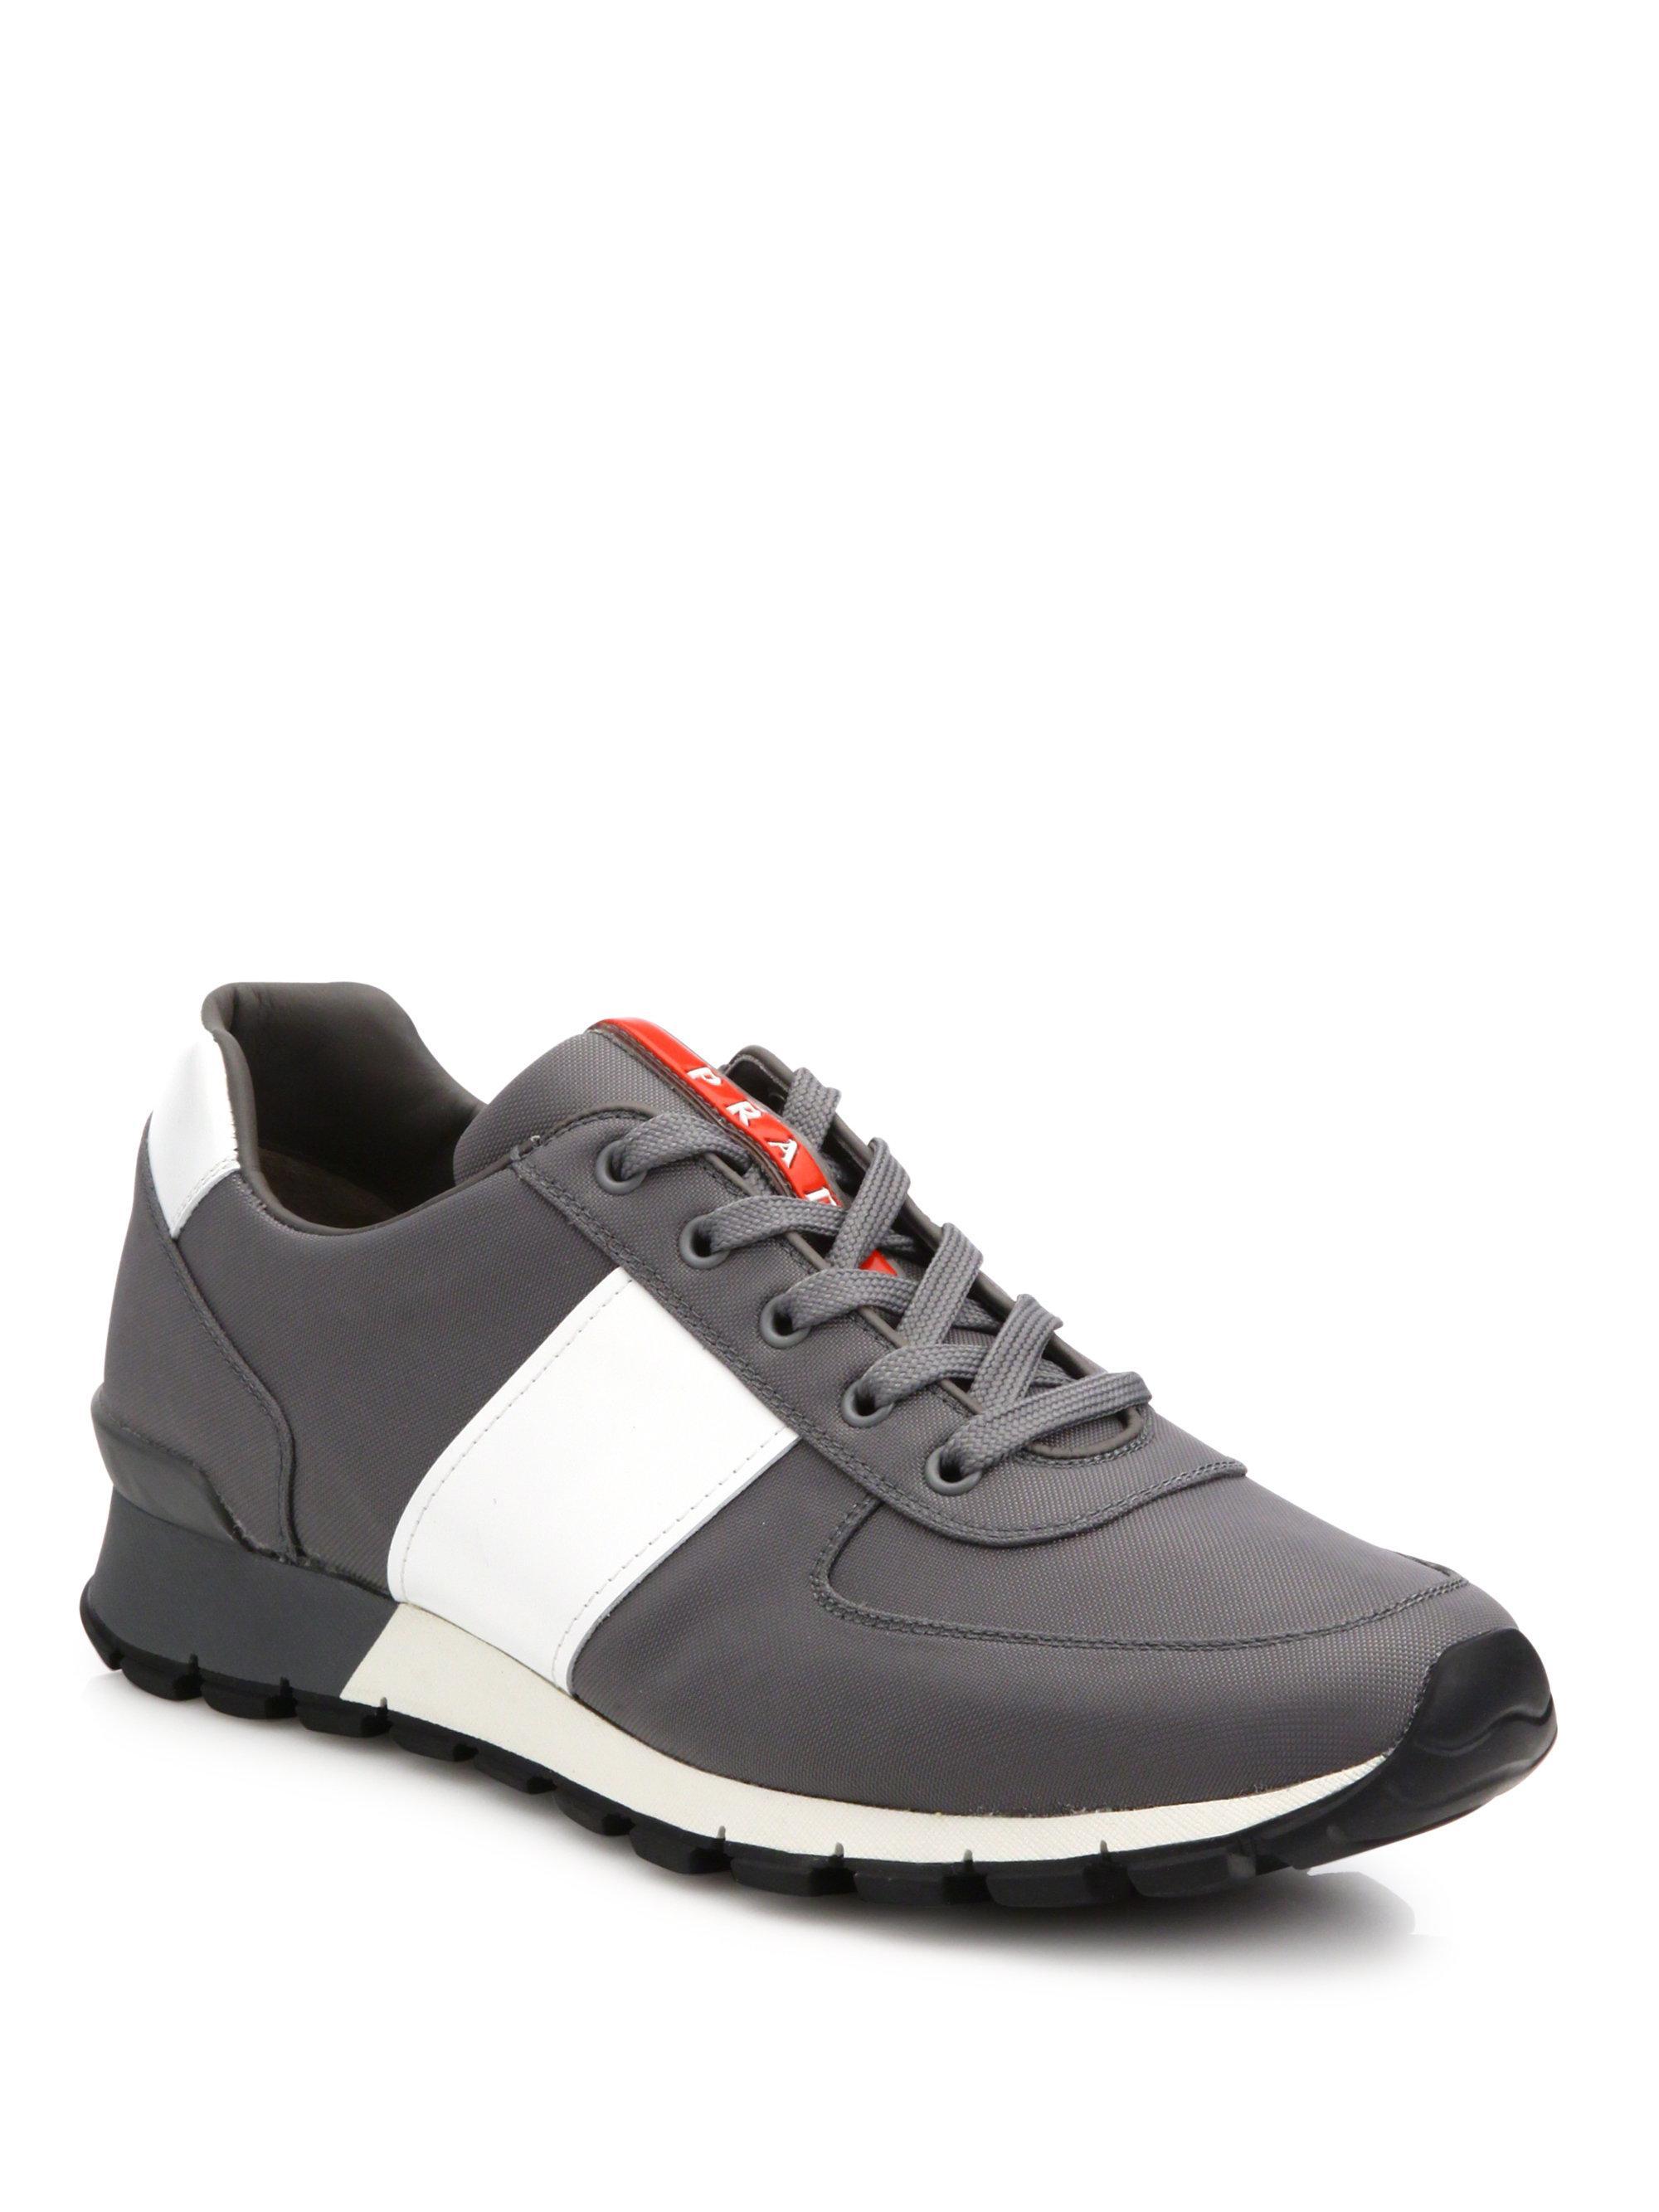 PradaSpazzolato Trainer Sneakers ZsDTELB